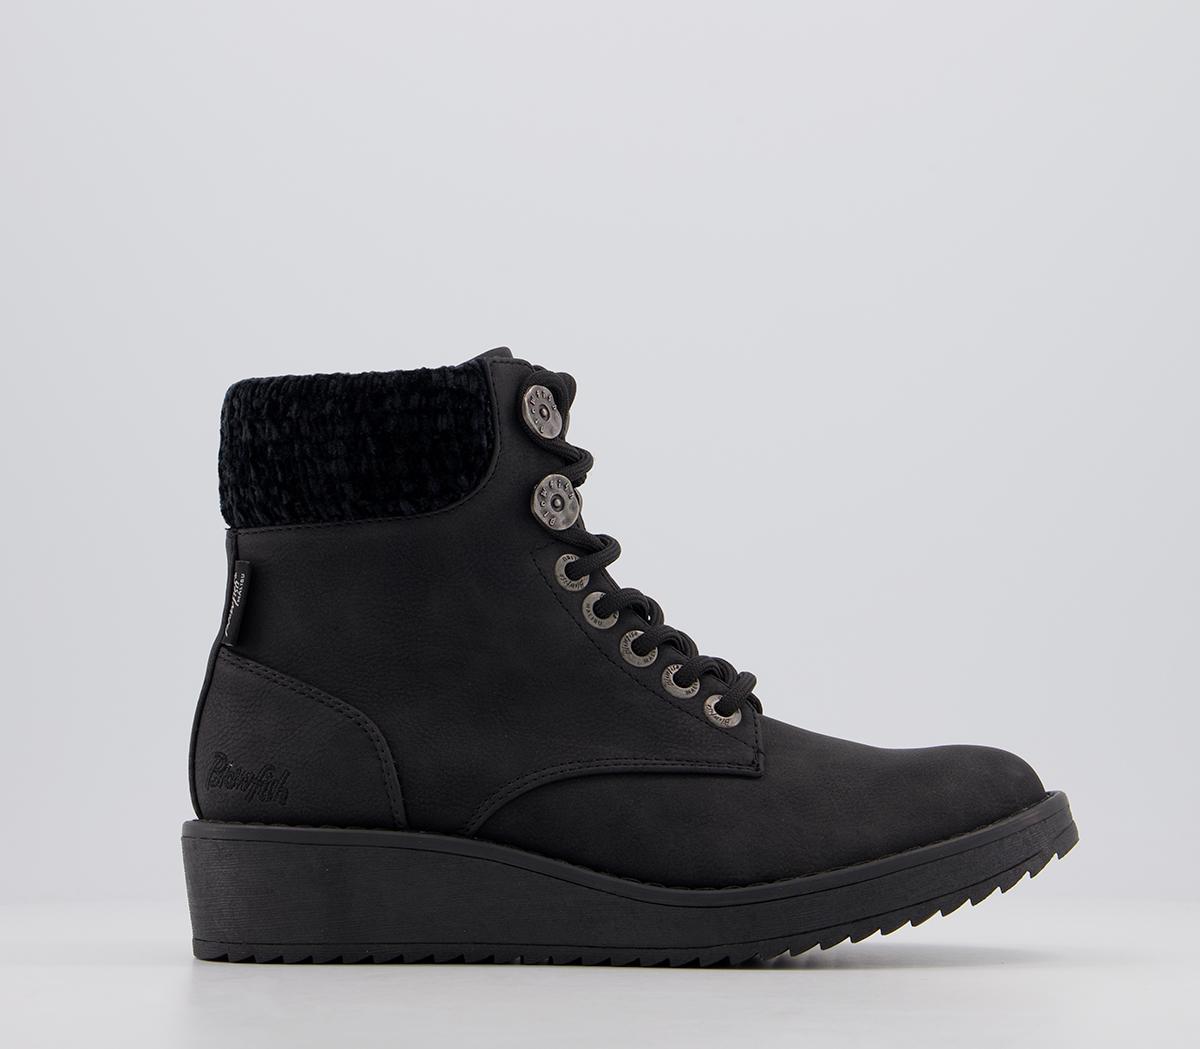 Chomper Wedge Boots